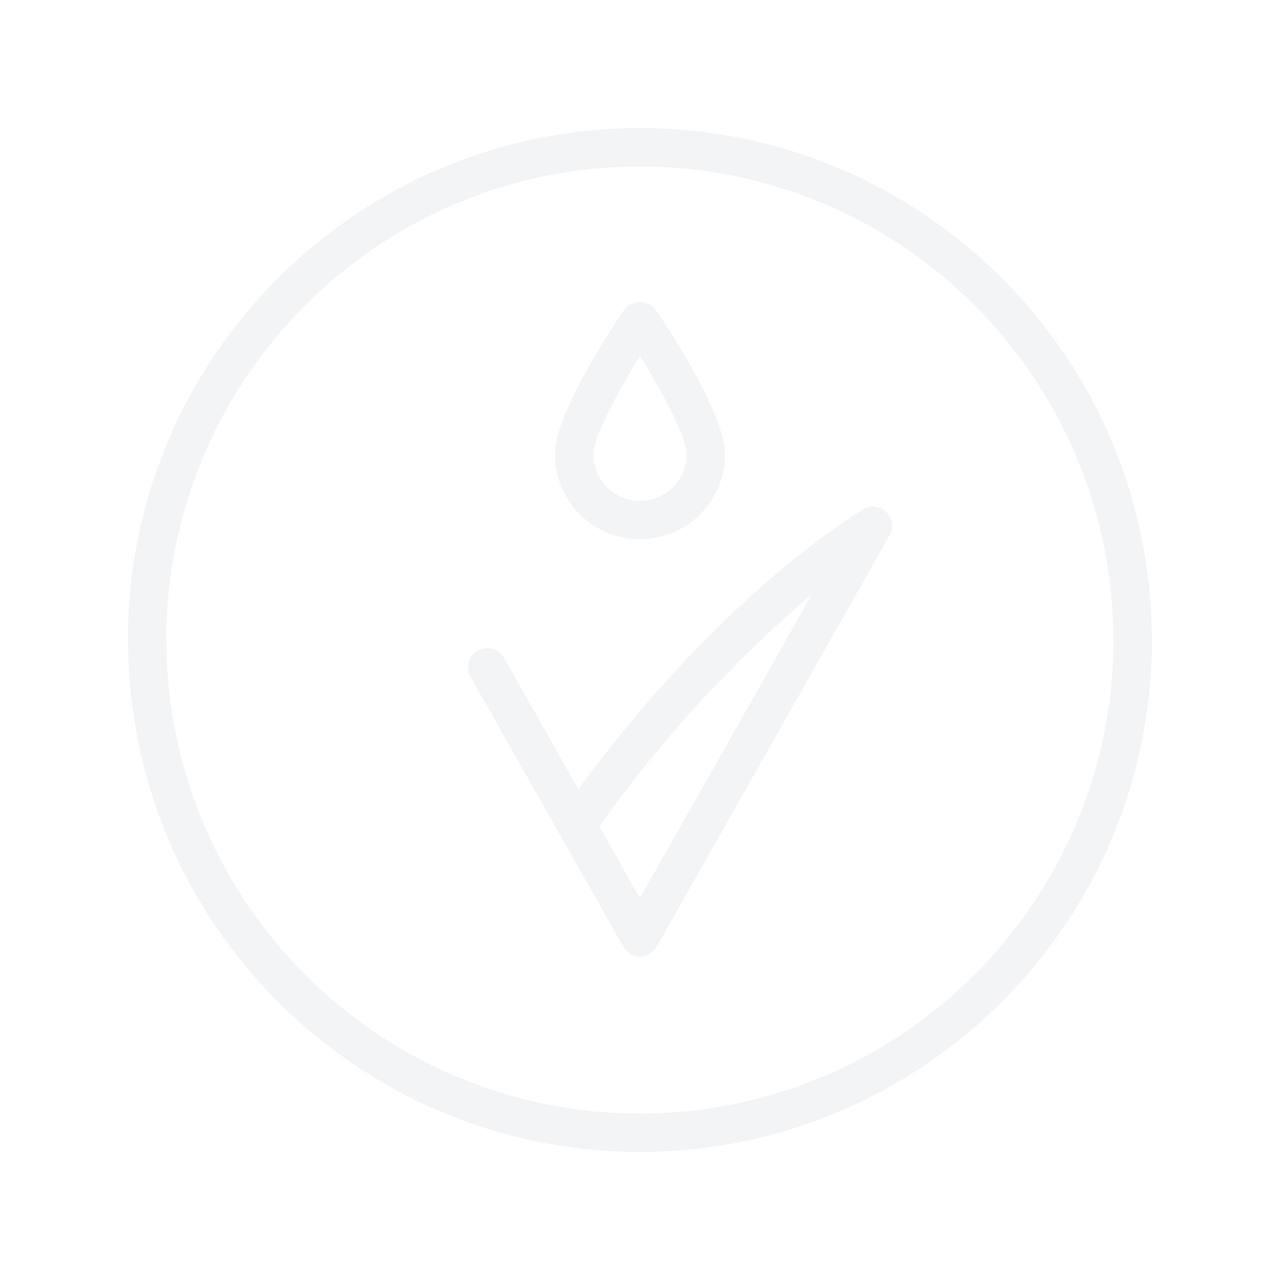 MINIGOLD Ricos Ring 16.5mm